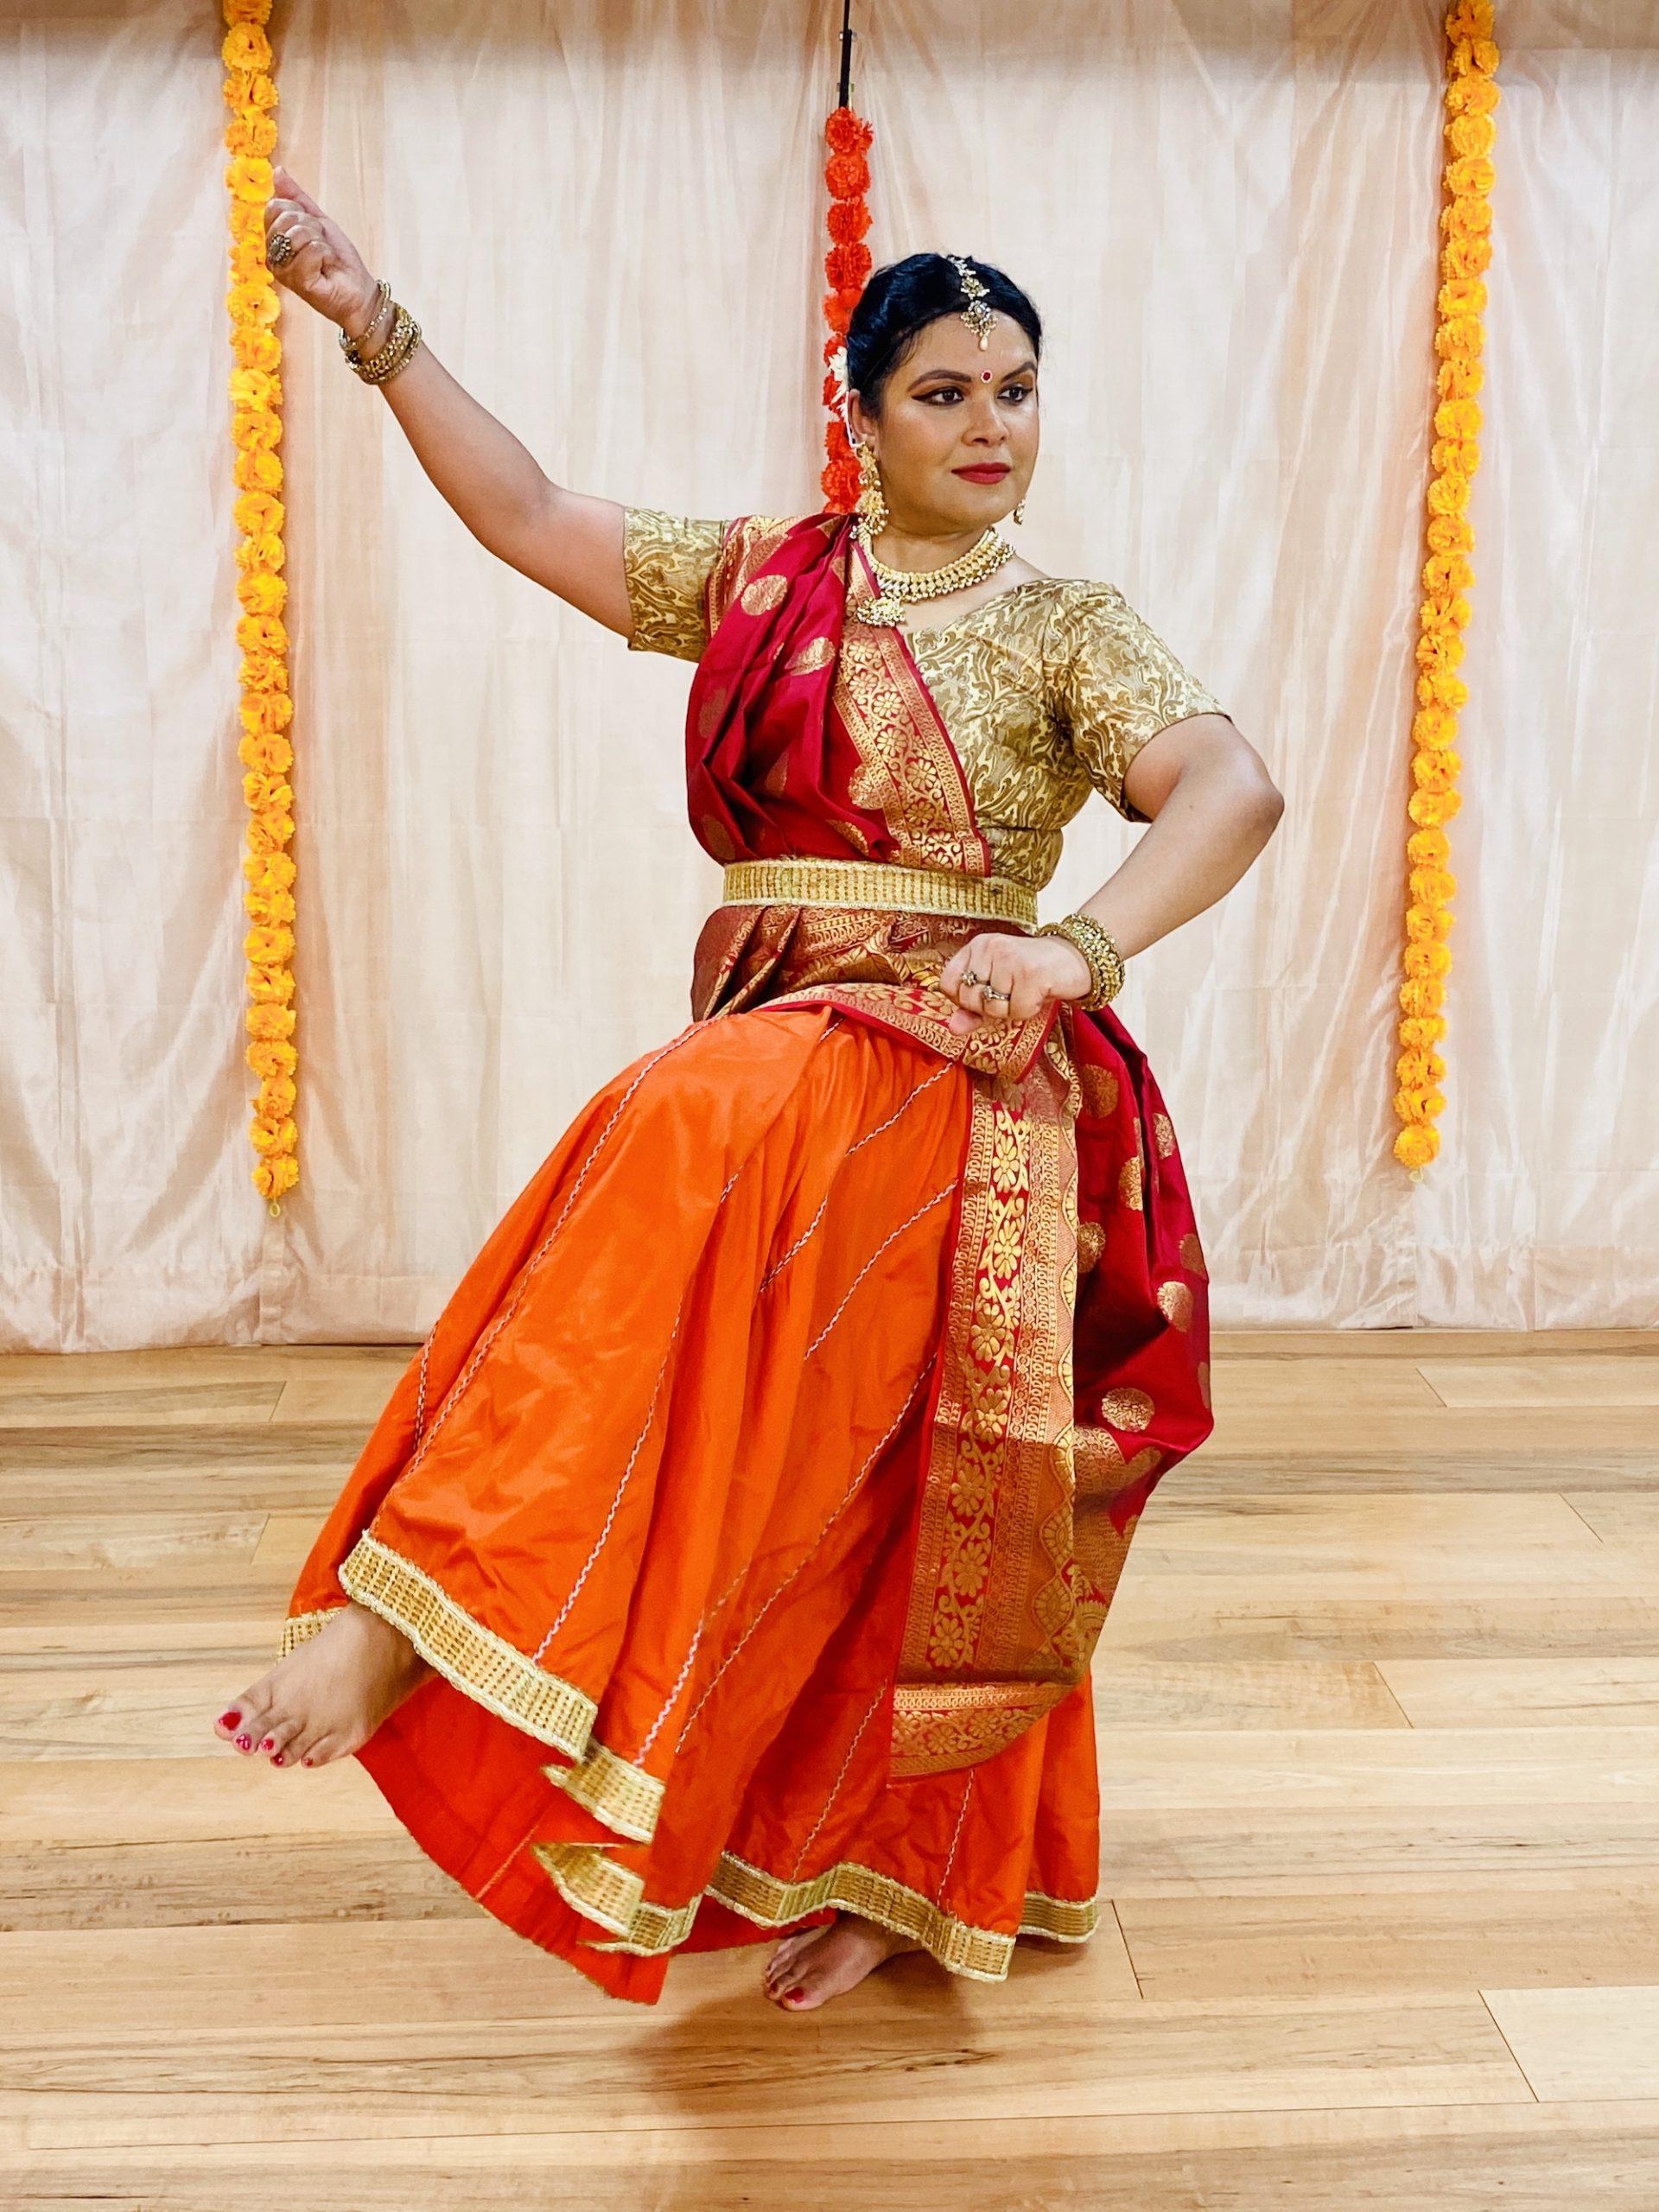 Author and Kathak Dancer, Anupama Srivastava performing Ram Rajya